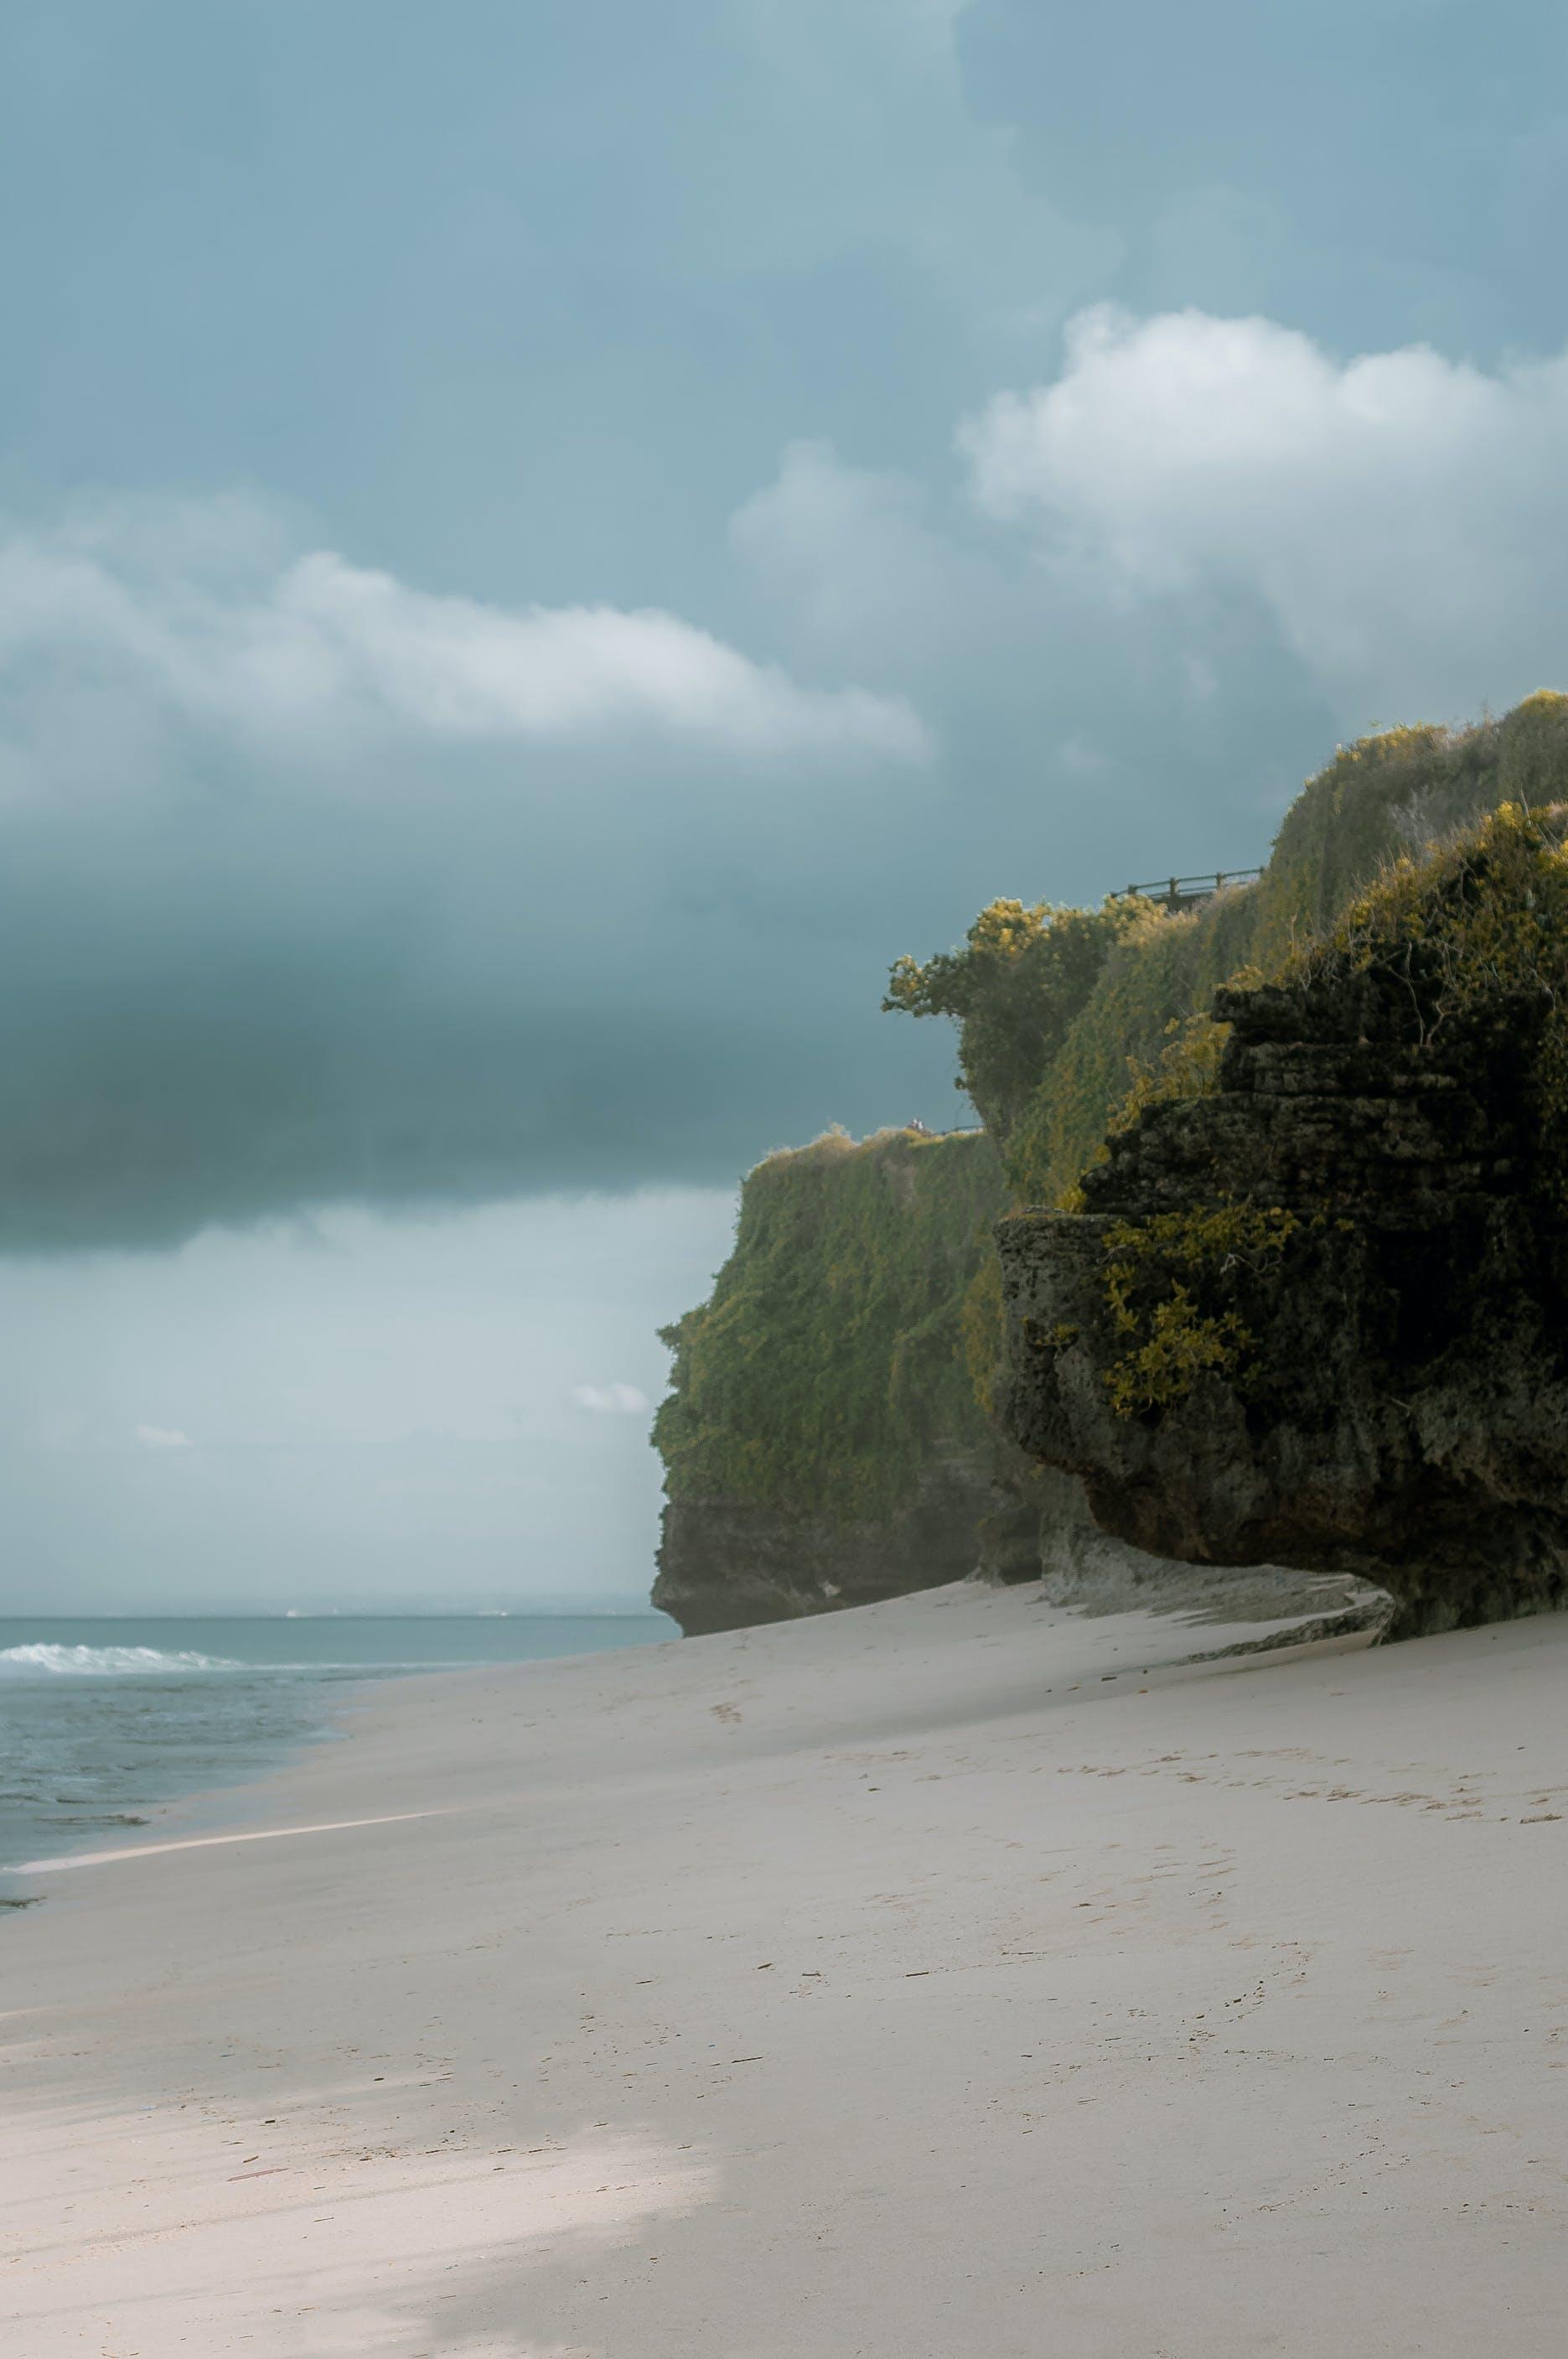 Free stock photo of bali, beach, beachlife, cliff